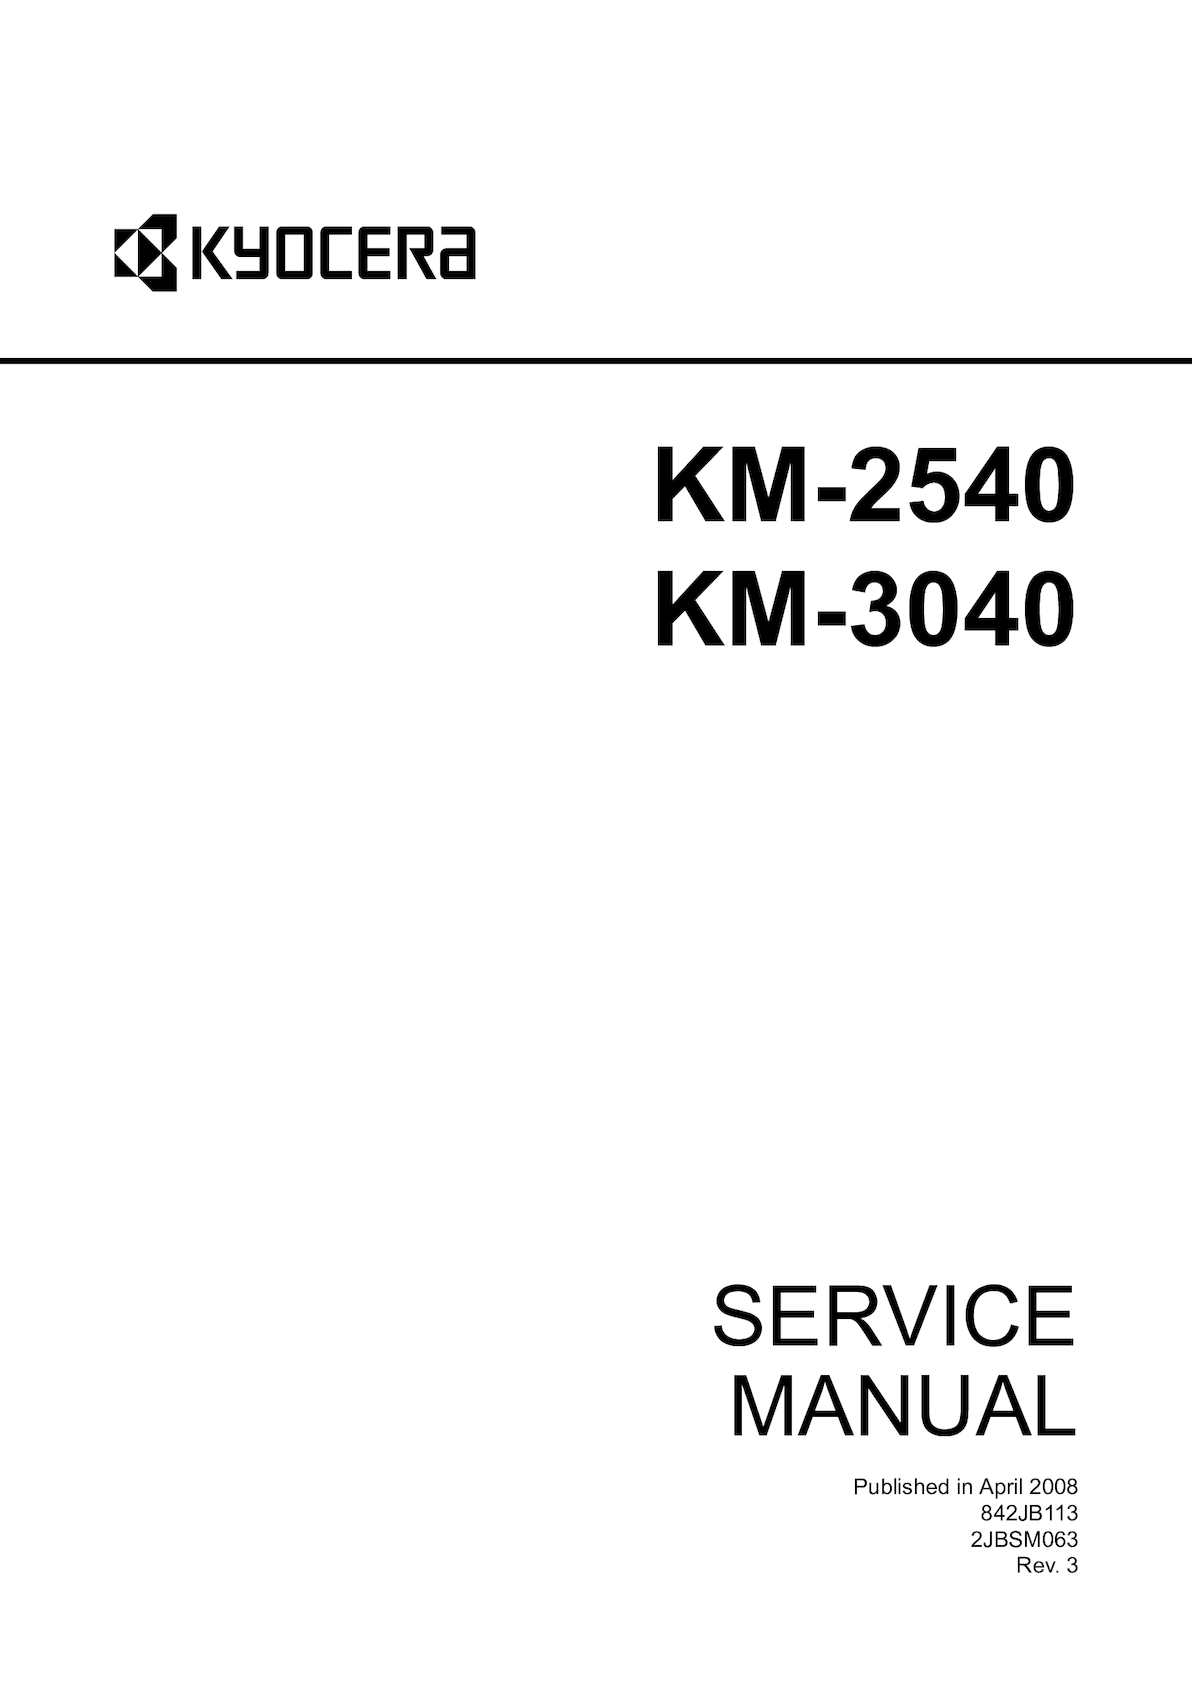 Appendere 33 Giri calaméo - km 2540 3040 sm rev3